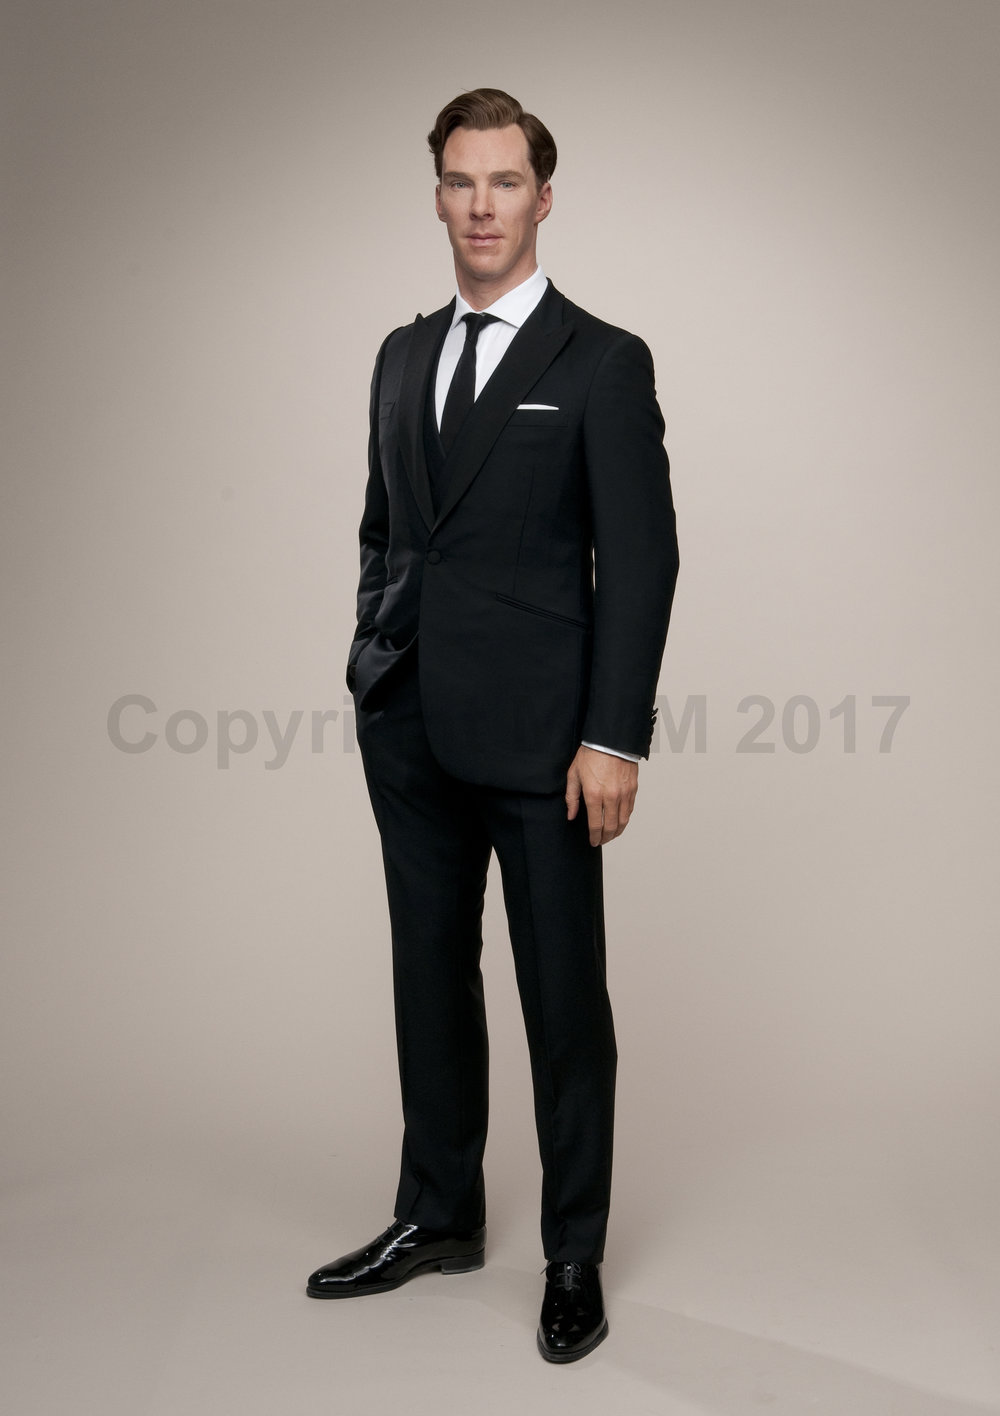 _DSC0473 - Benedict Cumberbatch MTL 2014.JPG